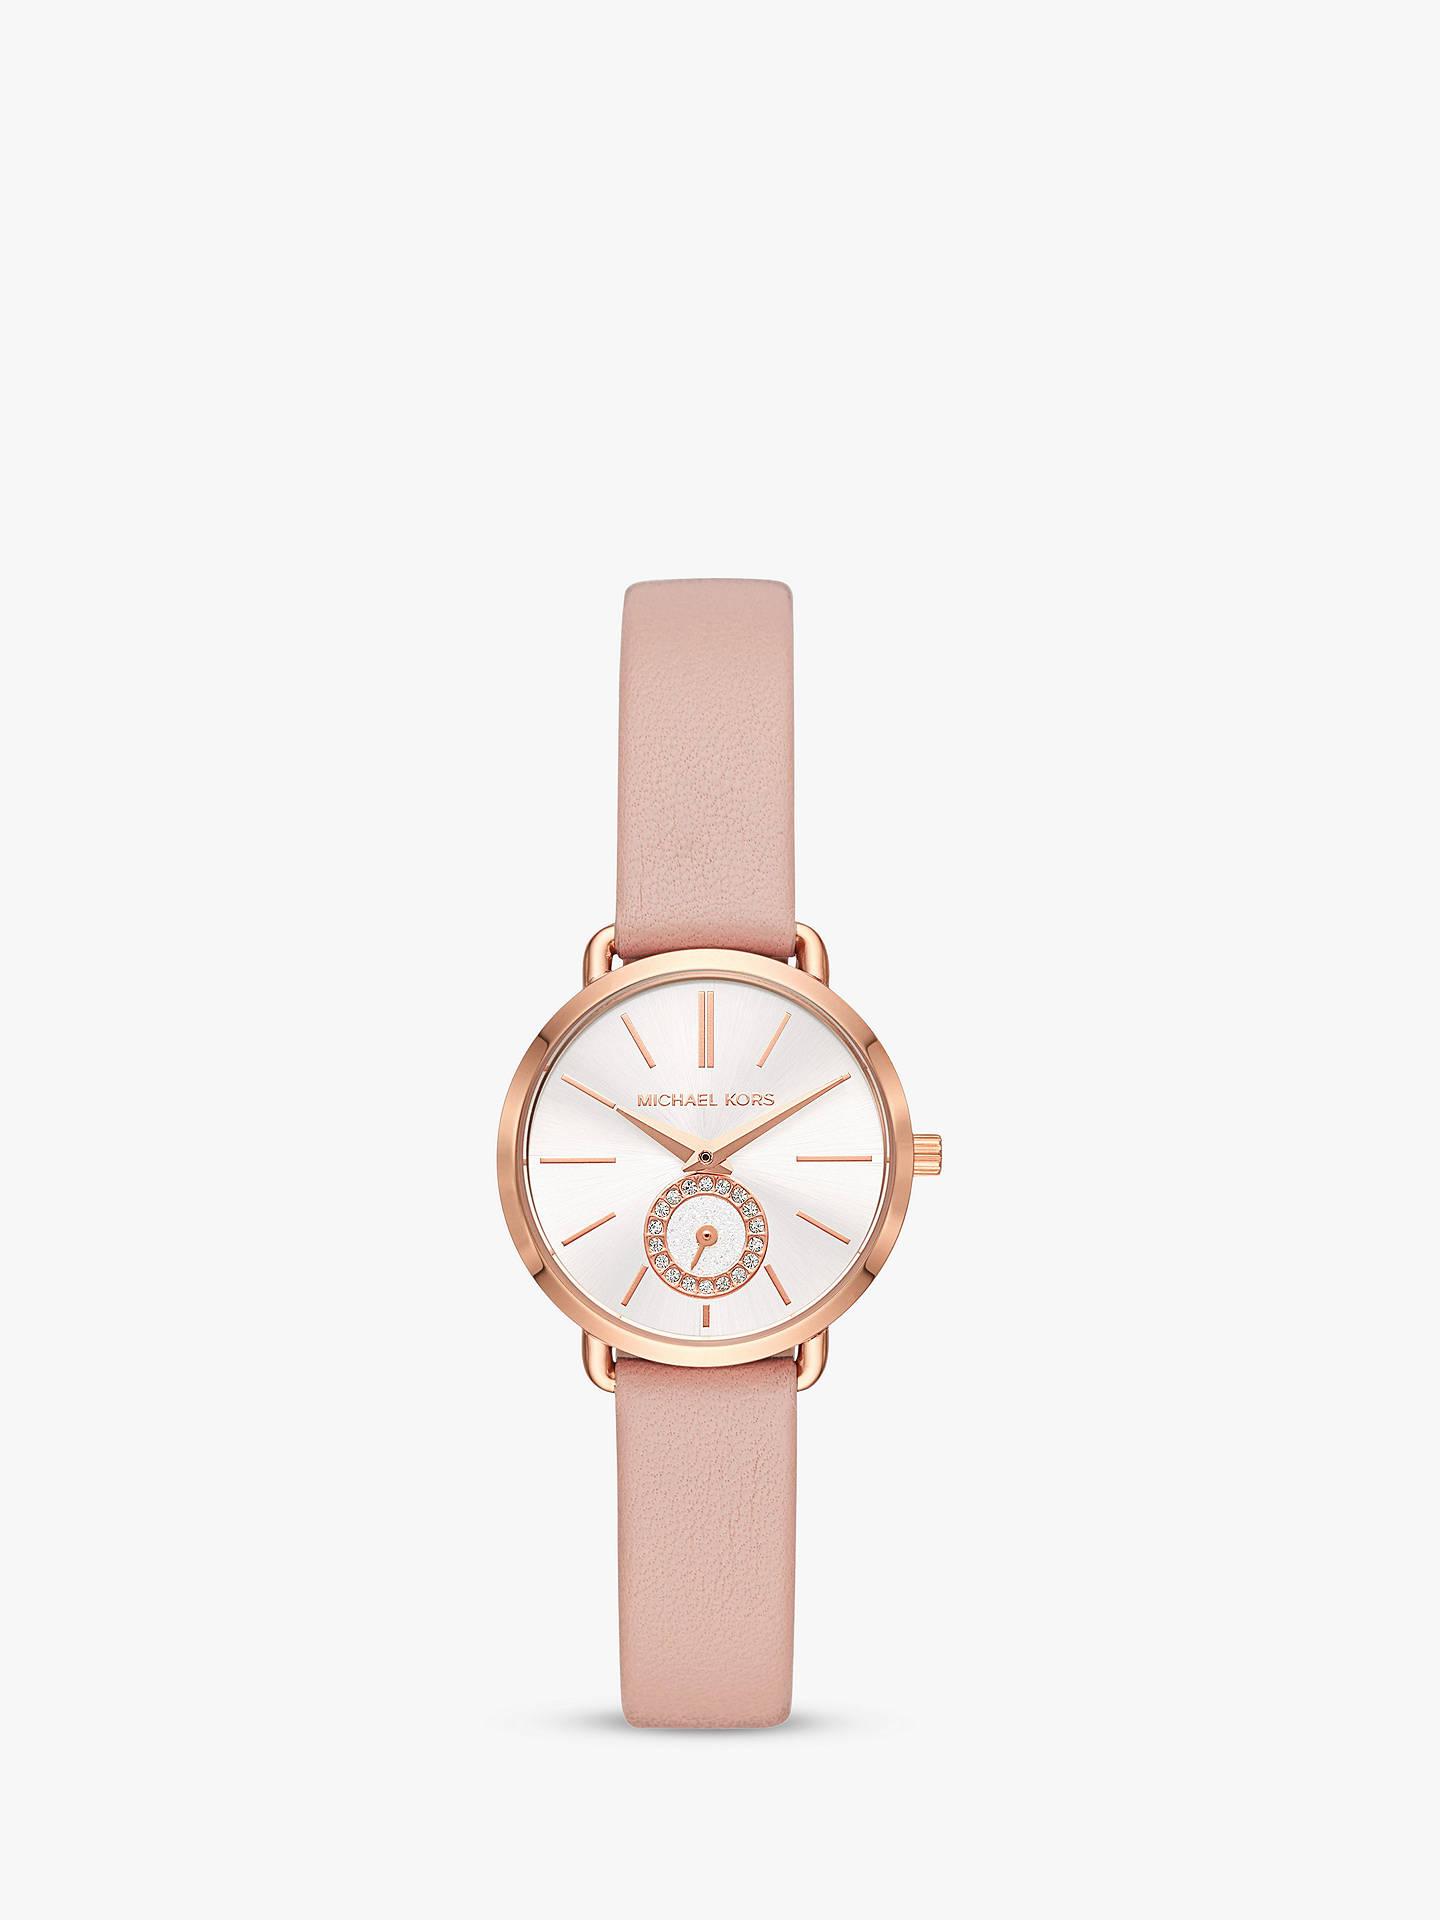 8f68e67664979 Buy Michael Kors Women's Portia Leather Strap Watch, Blush/White MK2735  Online at johnlewis ...